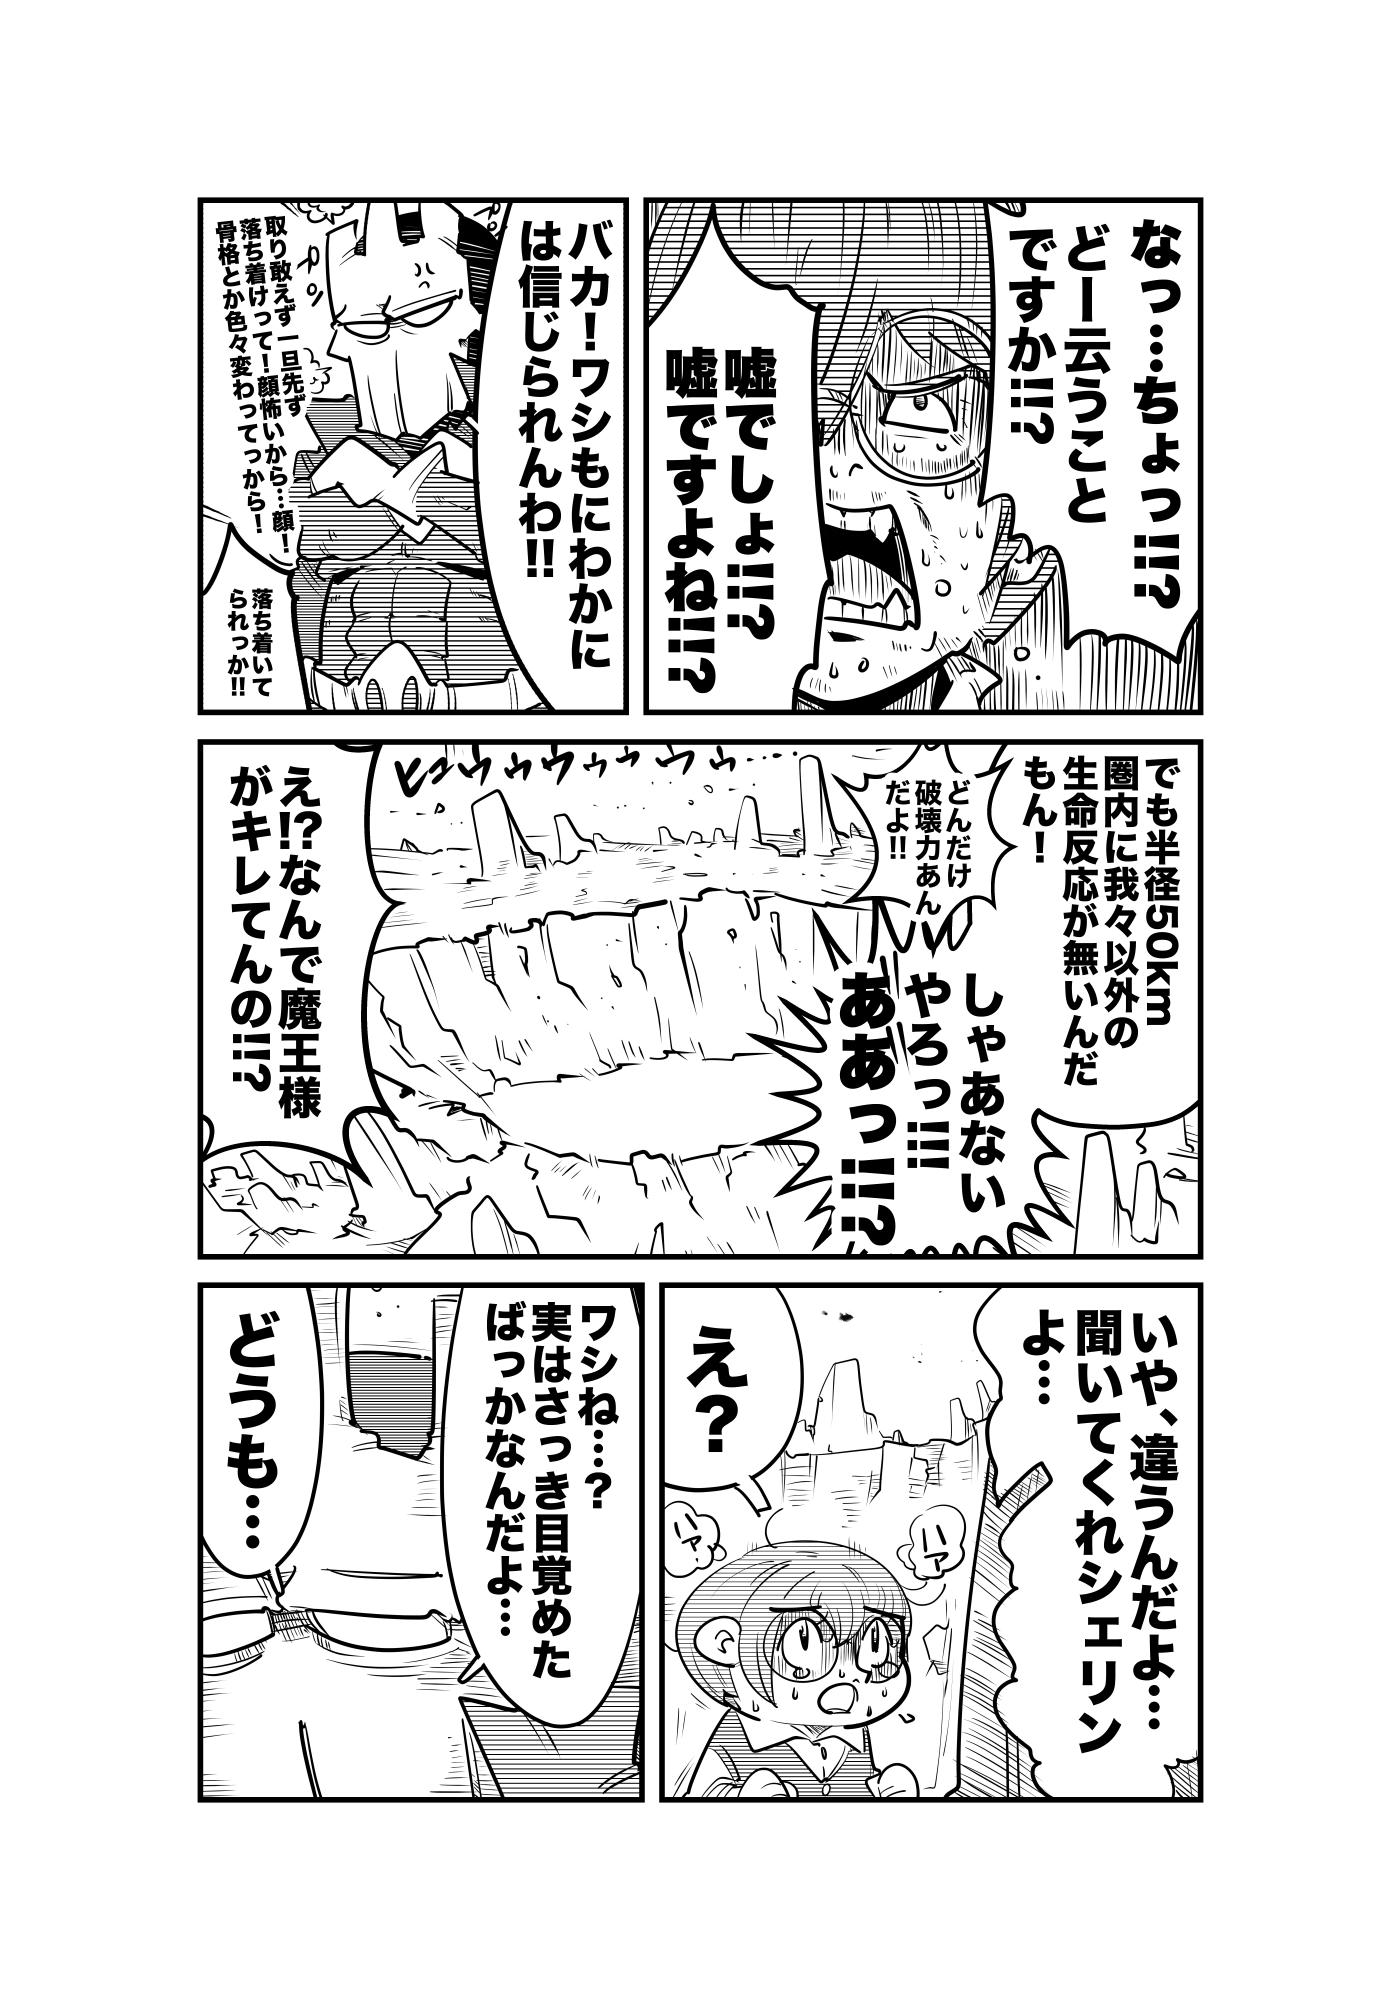 f:id:terashimaru117:20210914224522p:plain